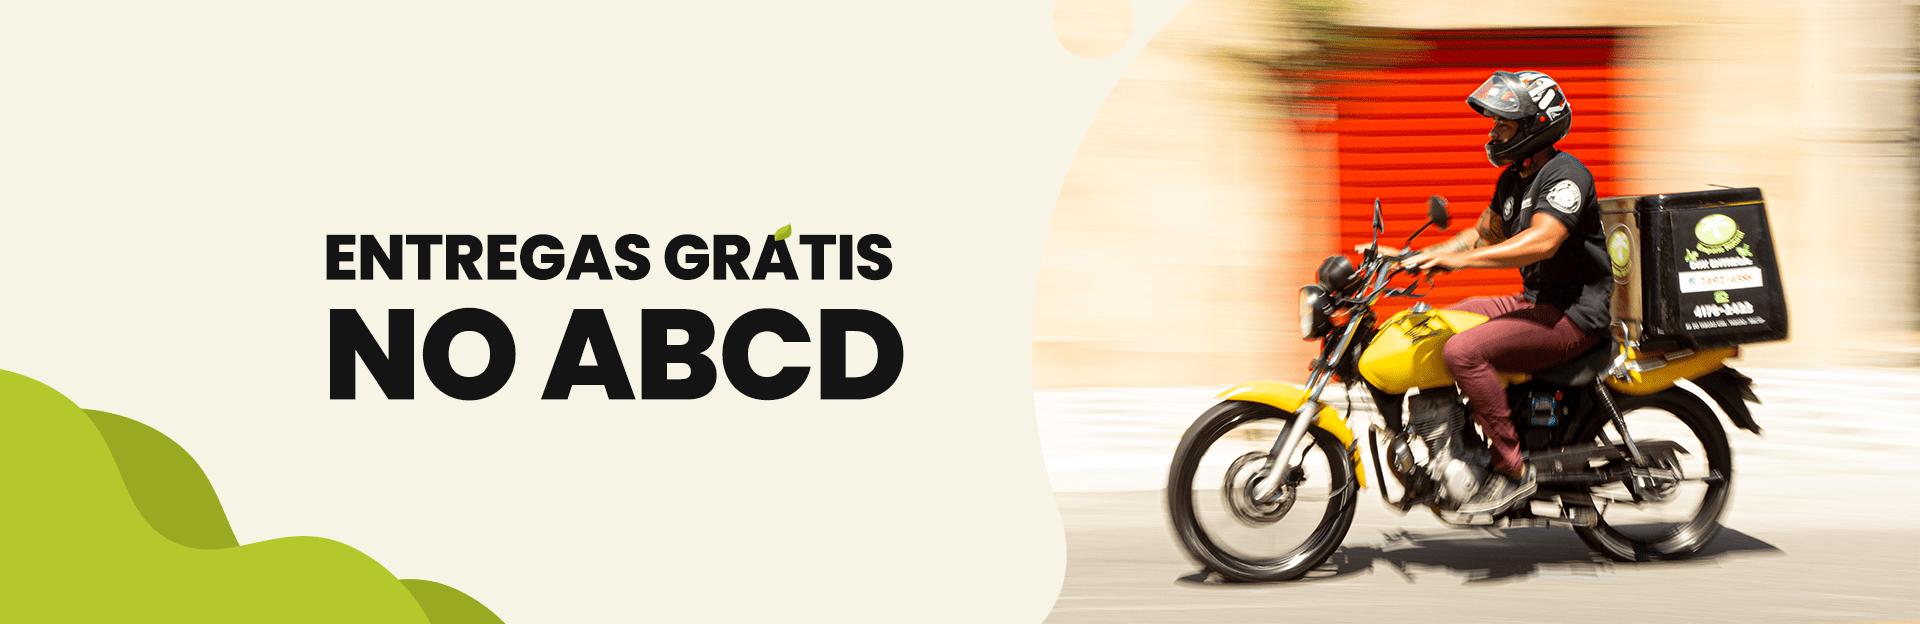 Fullbanner_ABCD